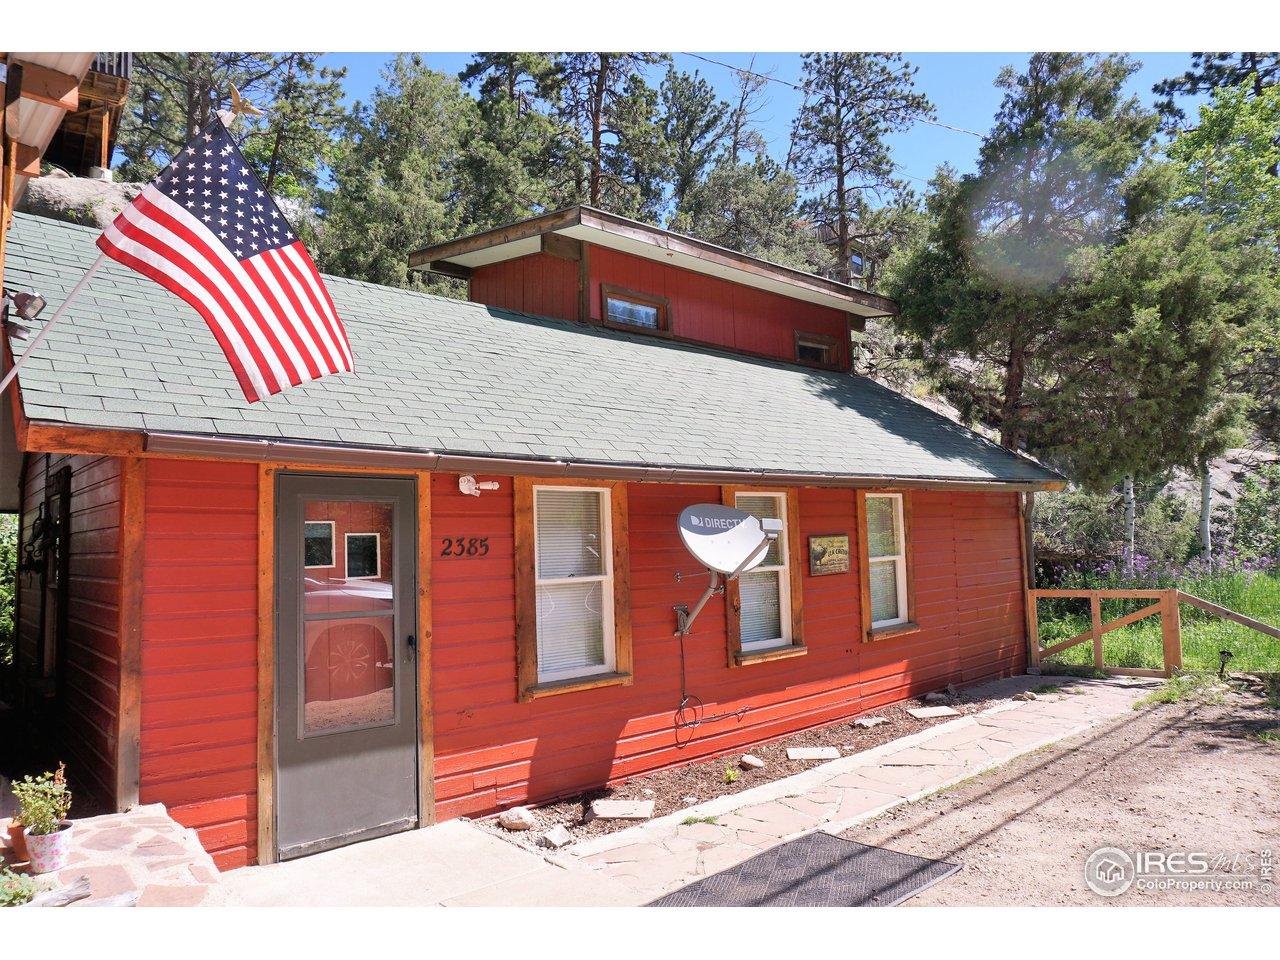 2385 Us Highway 34, Drake, CO 80515, Estes Park, MLS # 887120 | Pink Realty